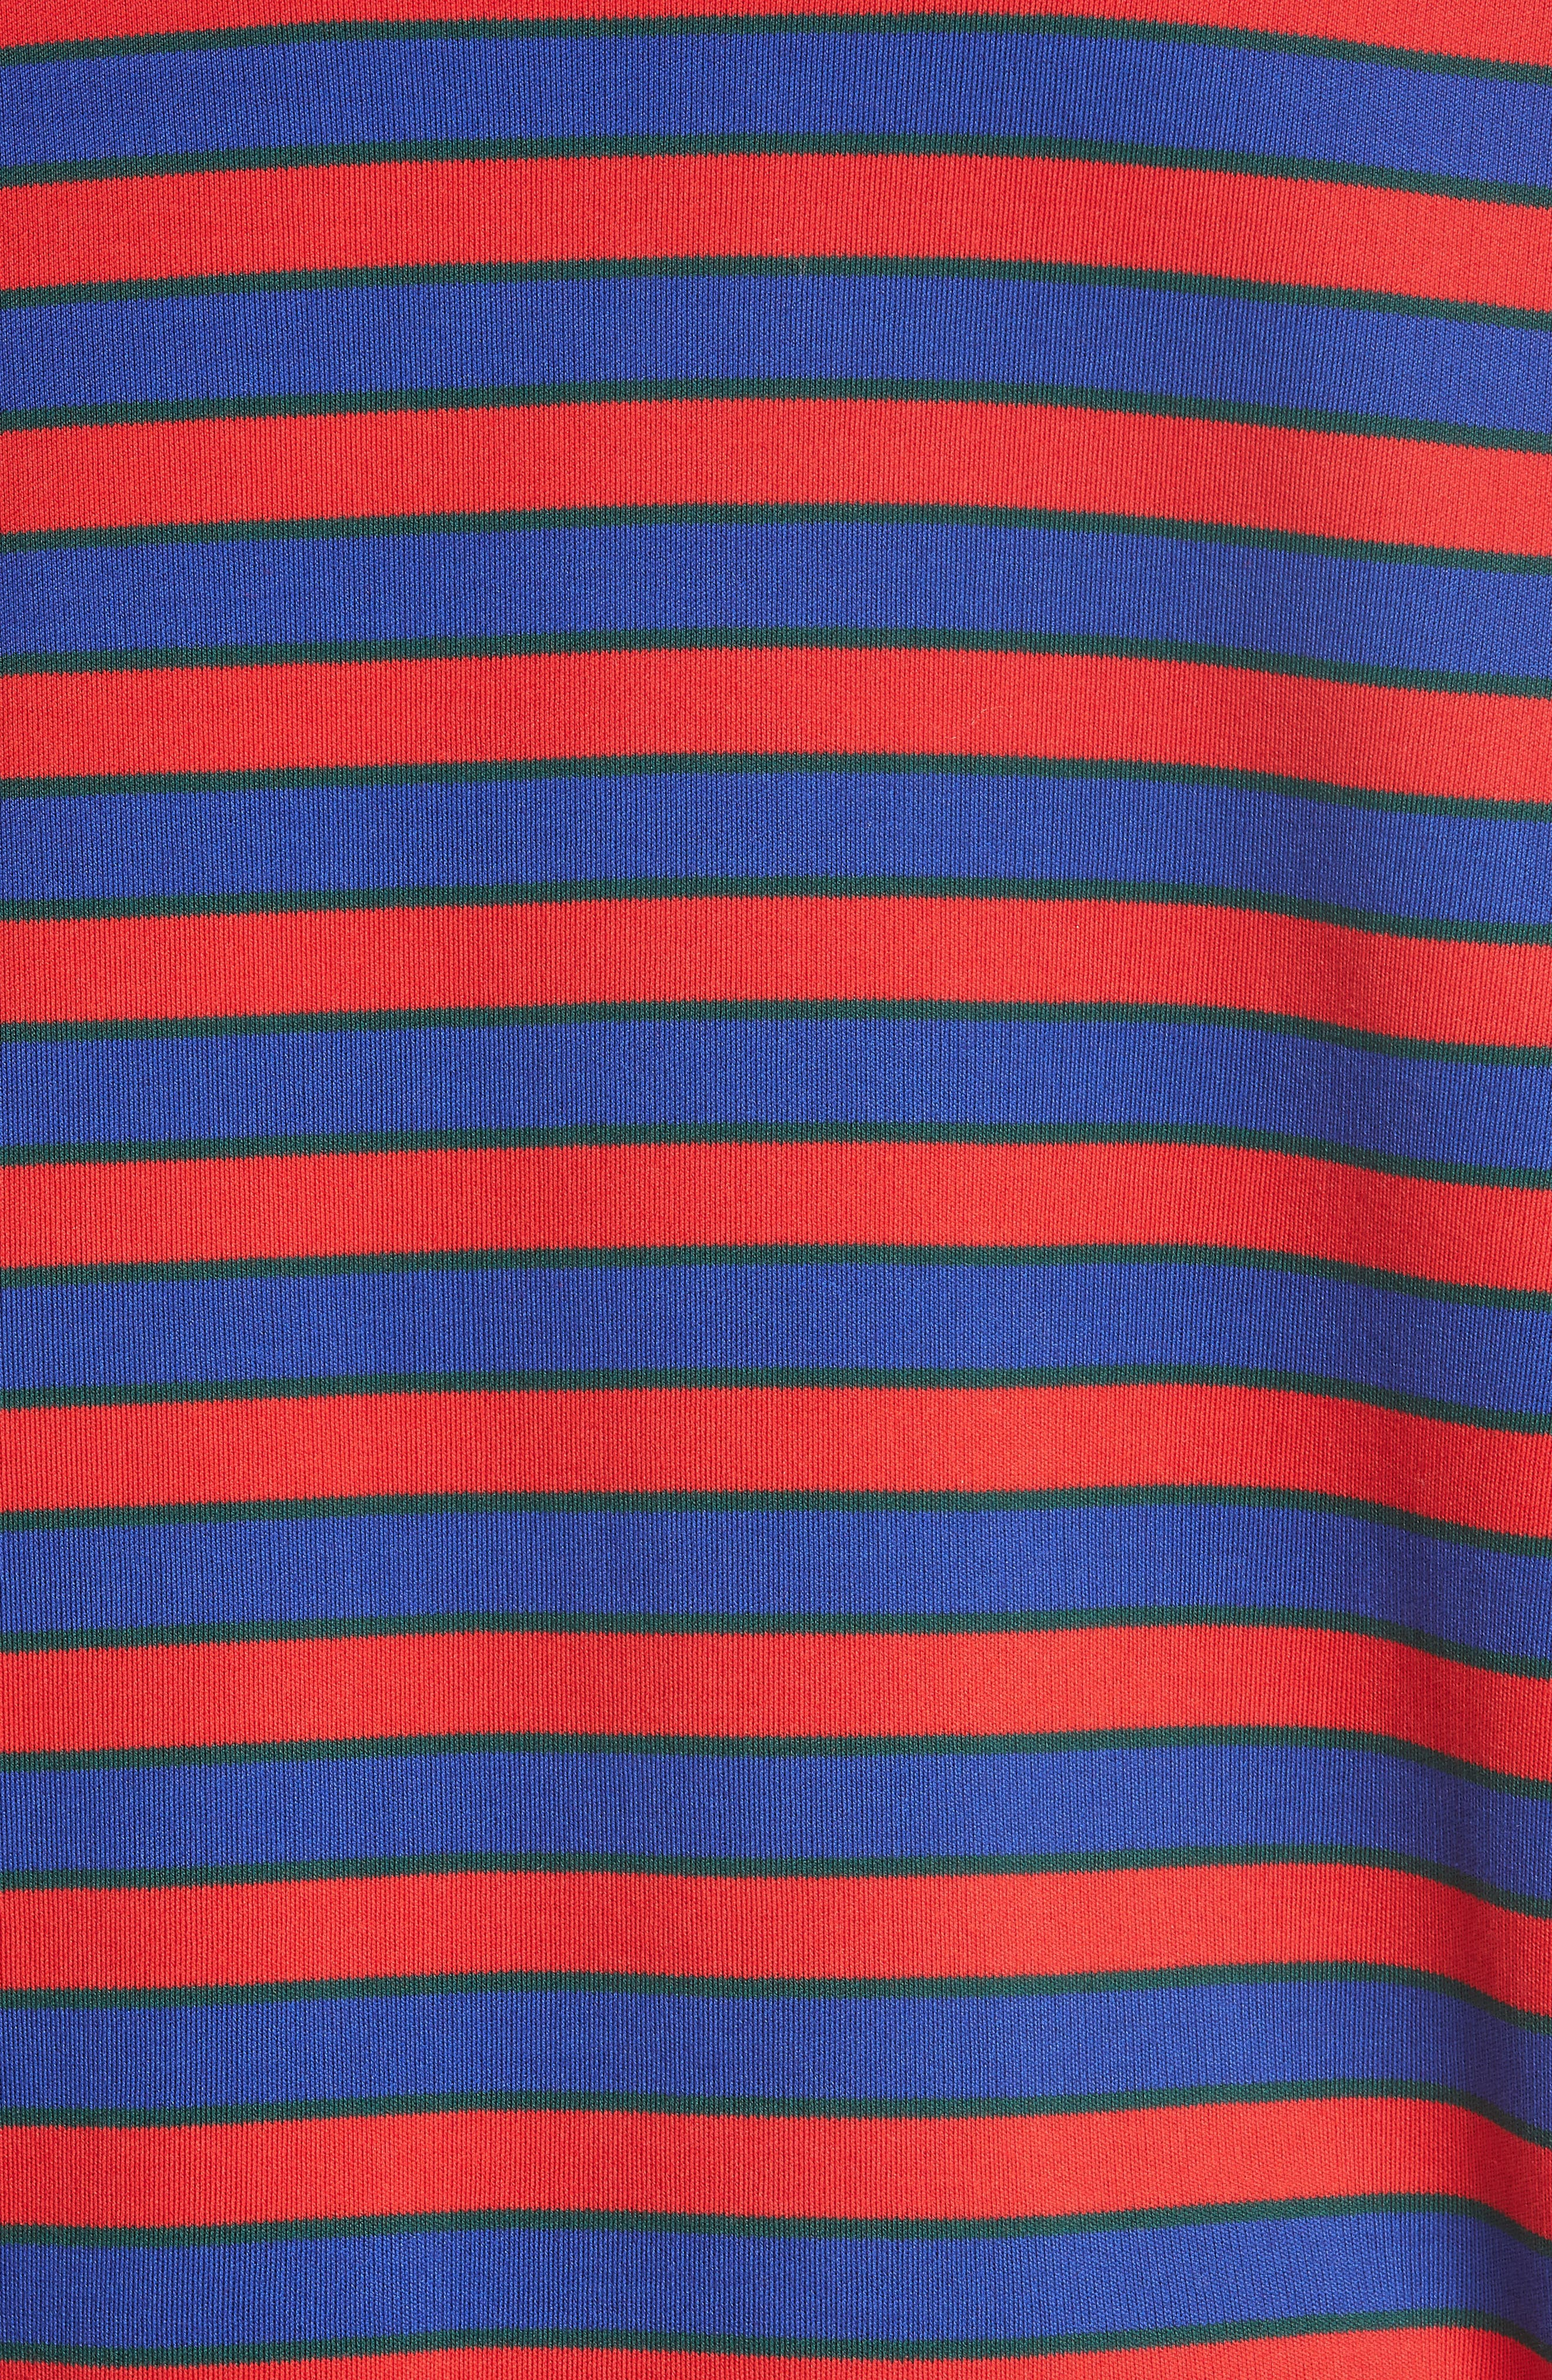 Short Sleeve Stripe Sweater,                             Alternate thumbnail 5, color,                             618